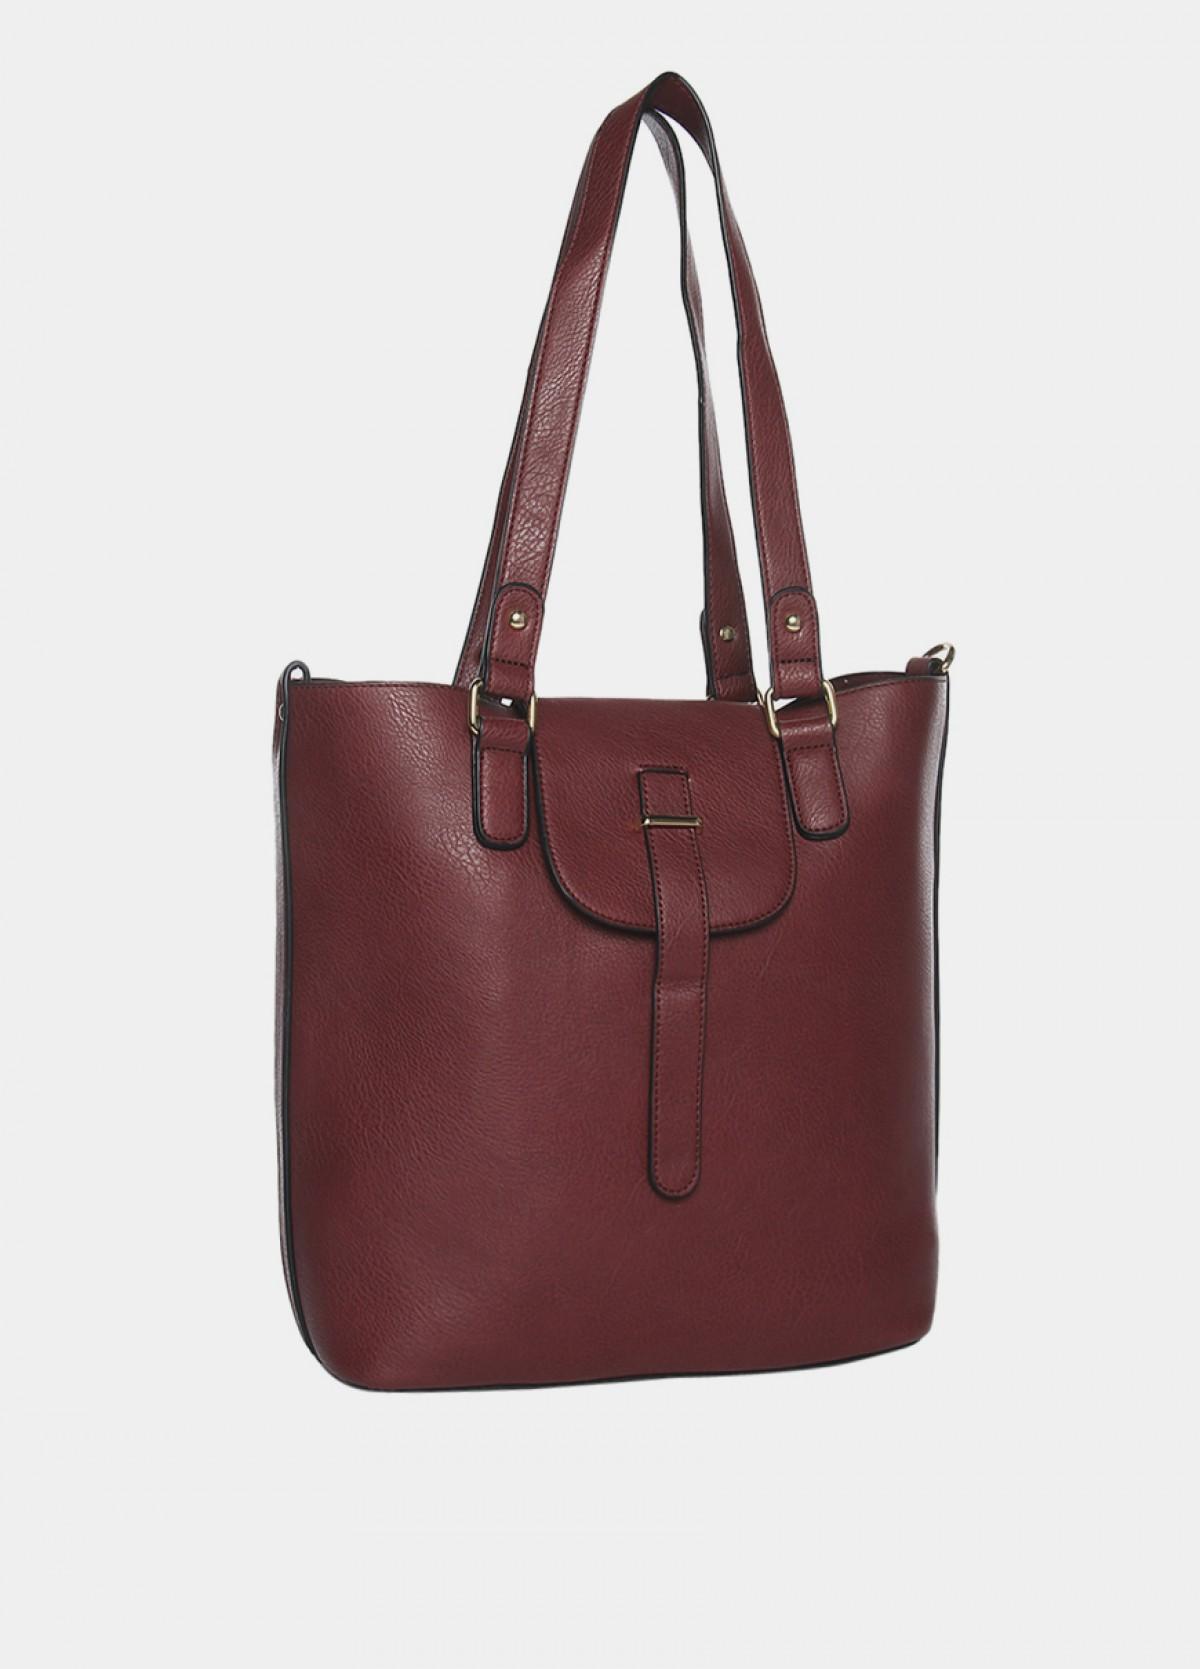 The Marsala Tote Handbag